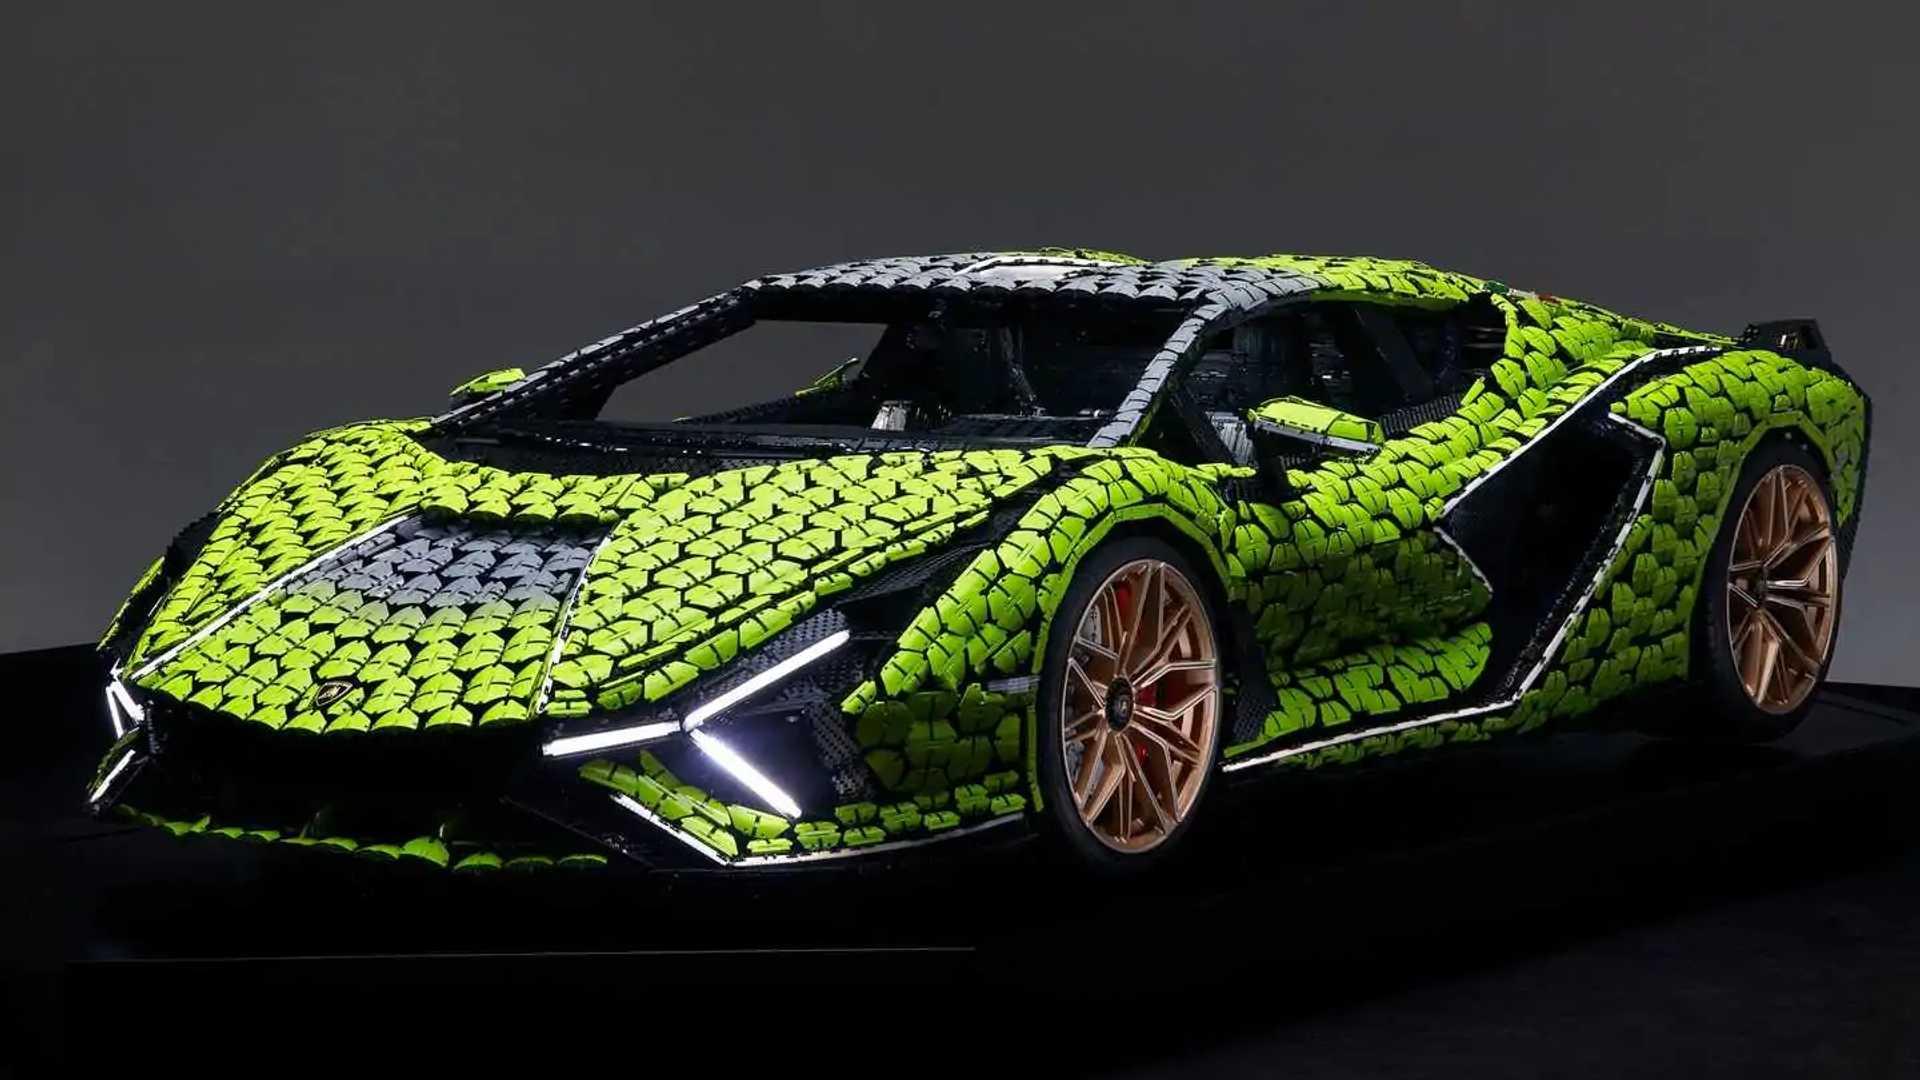 Lamborghini Sian FKP 37 Gets Epic Life-Size Lego Replica